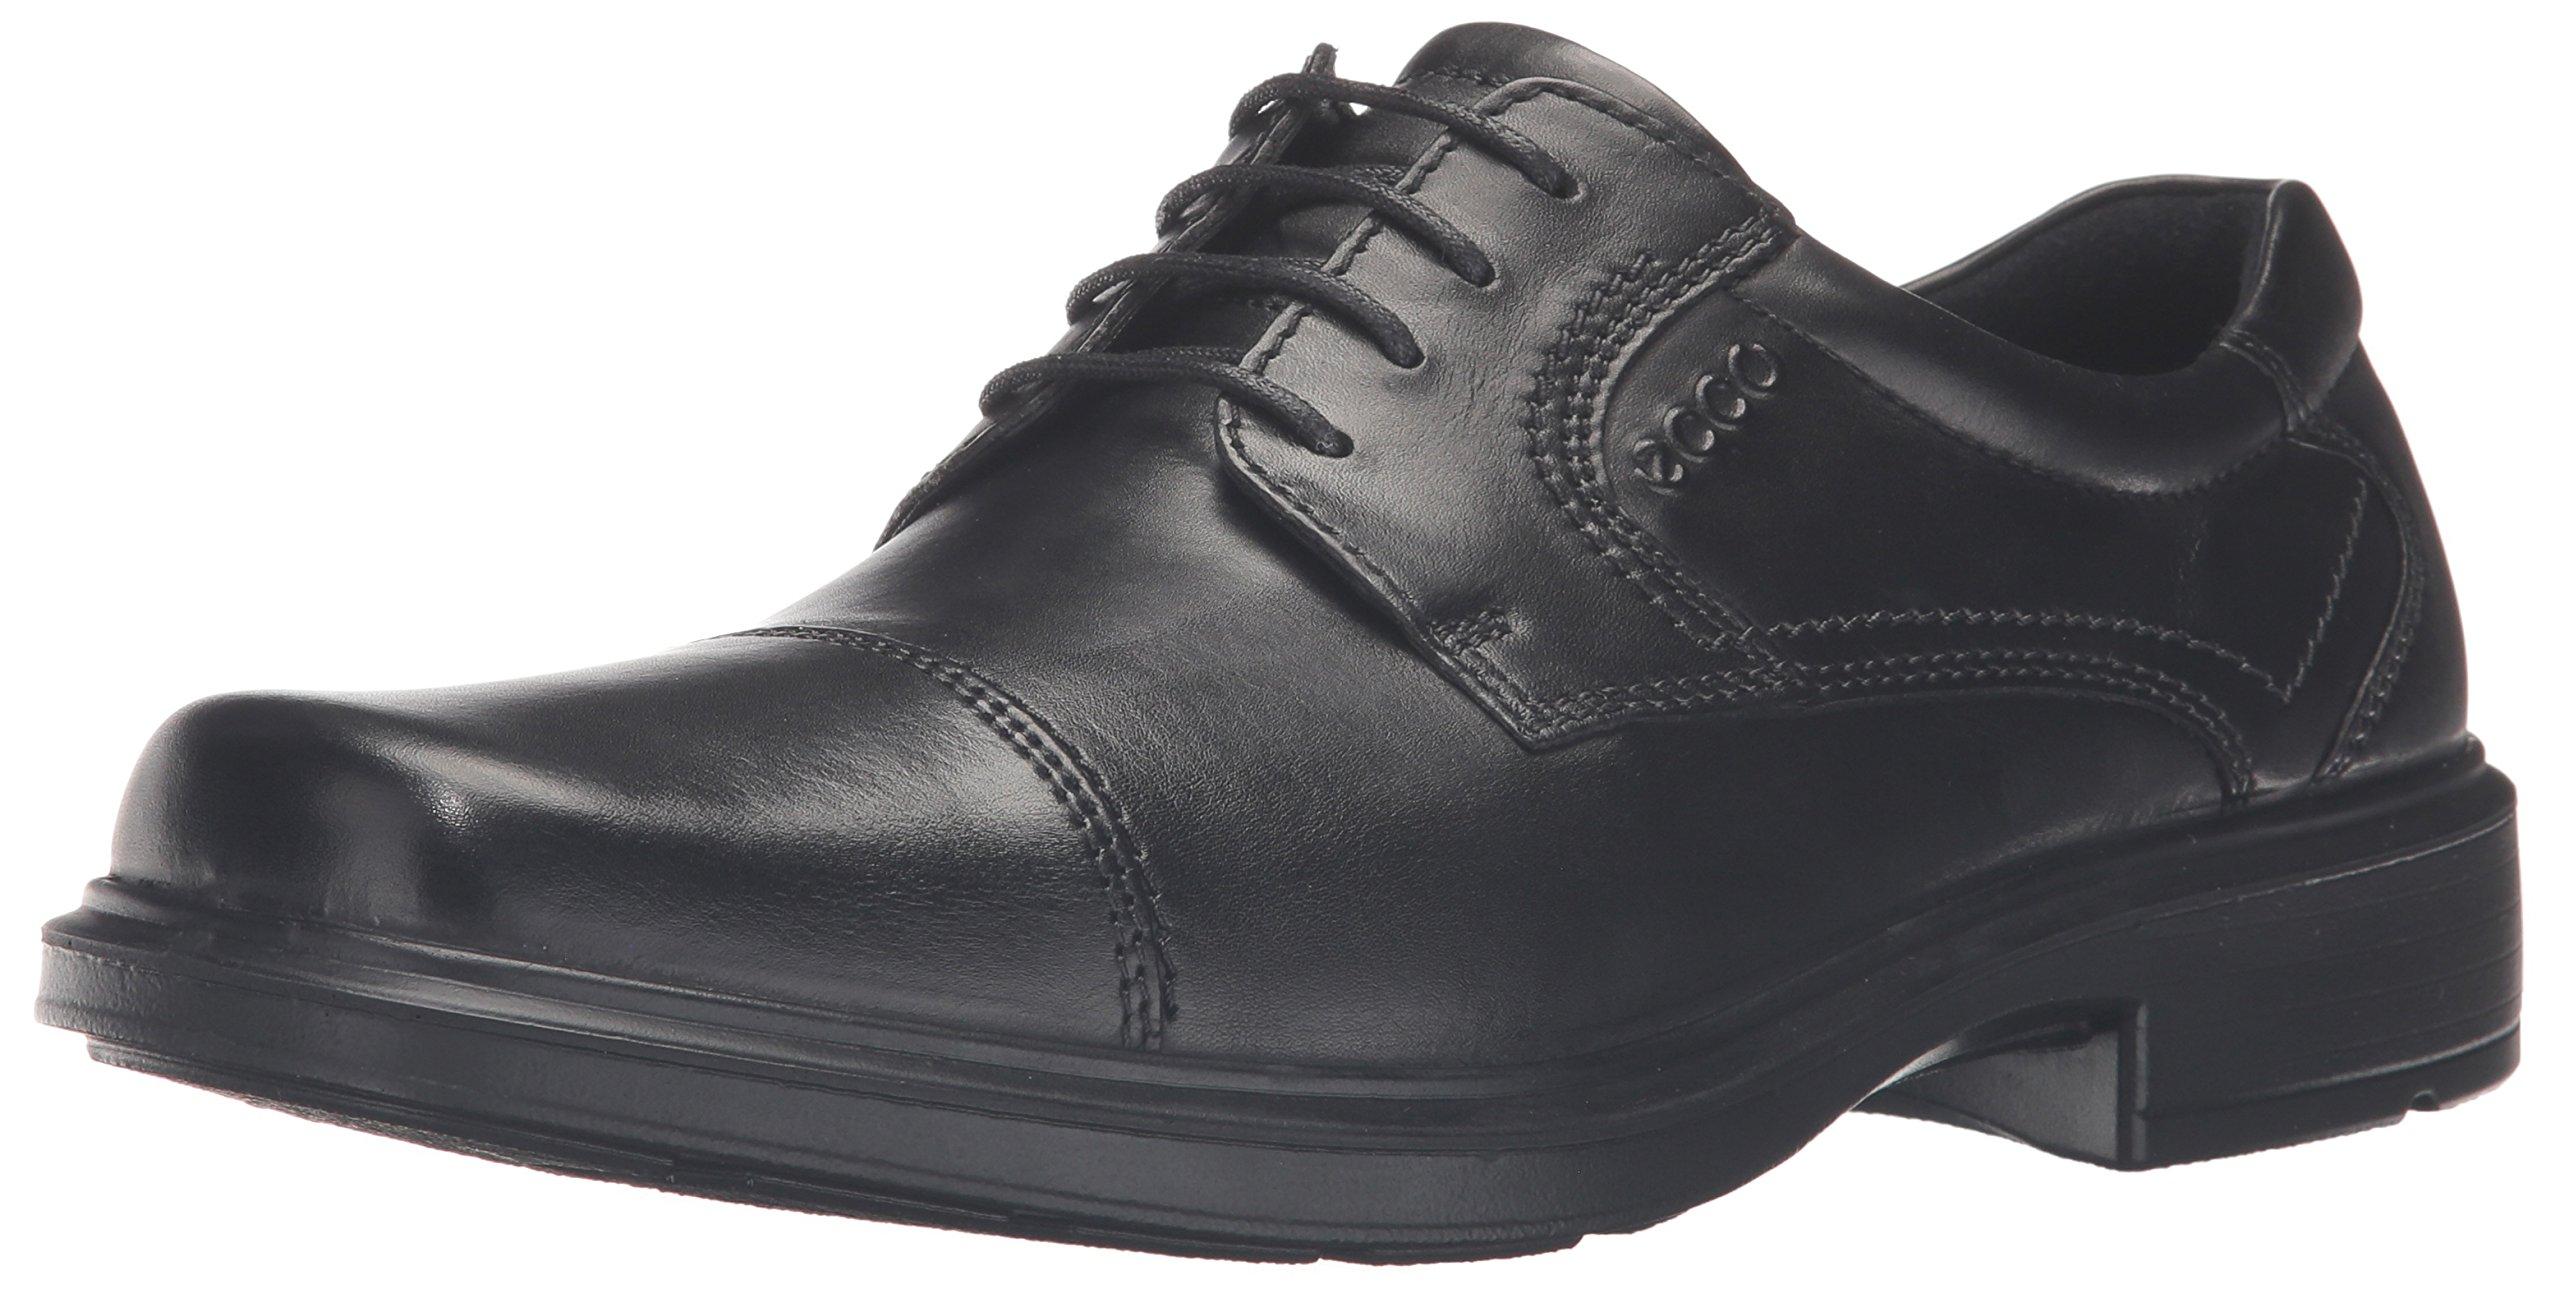 ECCO Men's Helsinki Cap-Toe Oxford Dress Shoe,Black,45 (US Men's 11-11.5) M